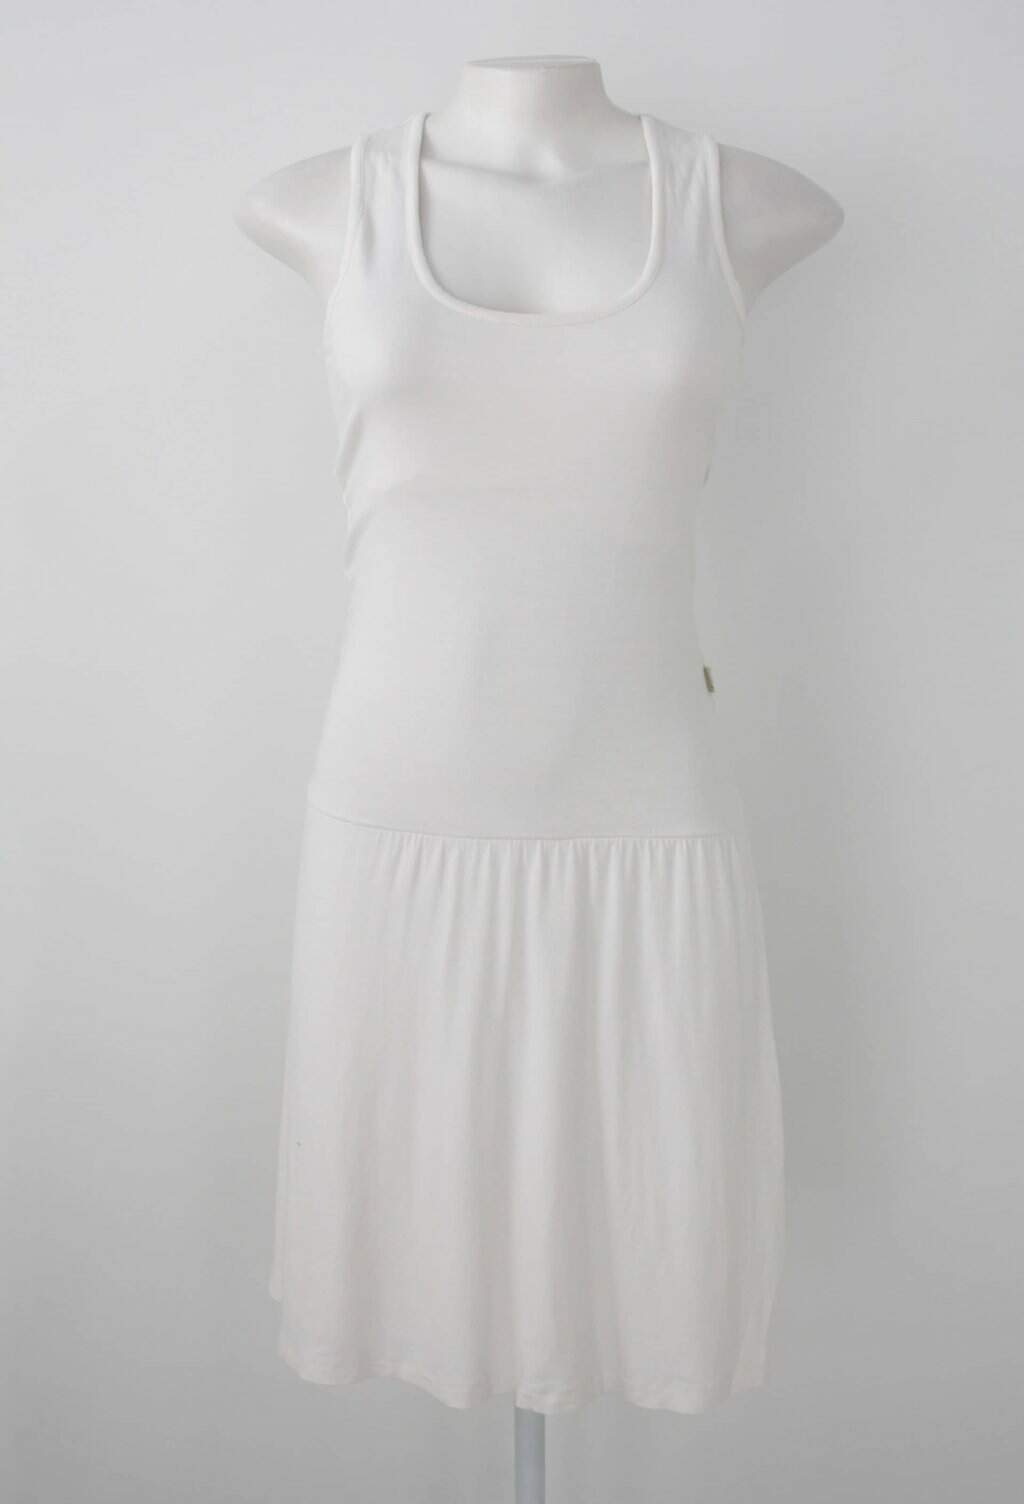 Vestido pango feminino off-white com Renda e Meio forro